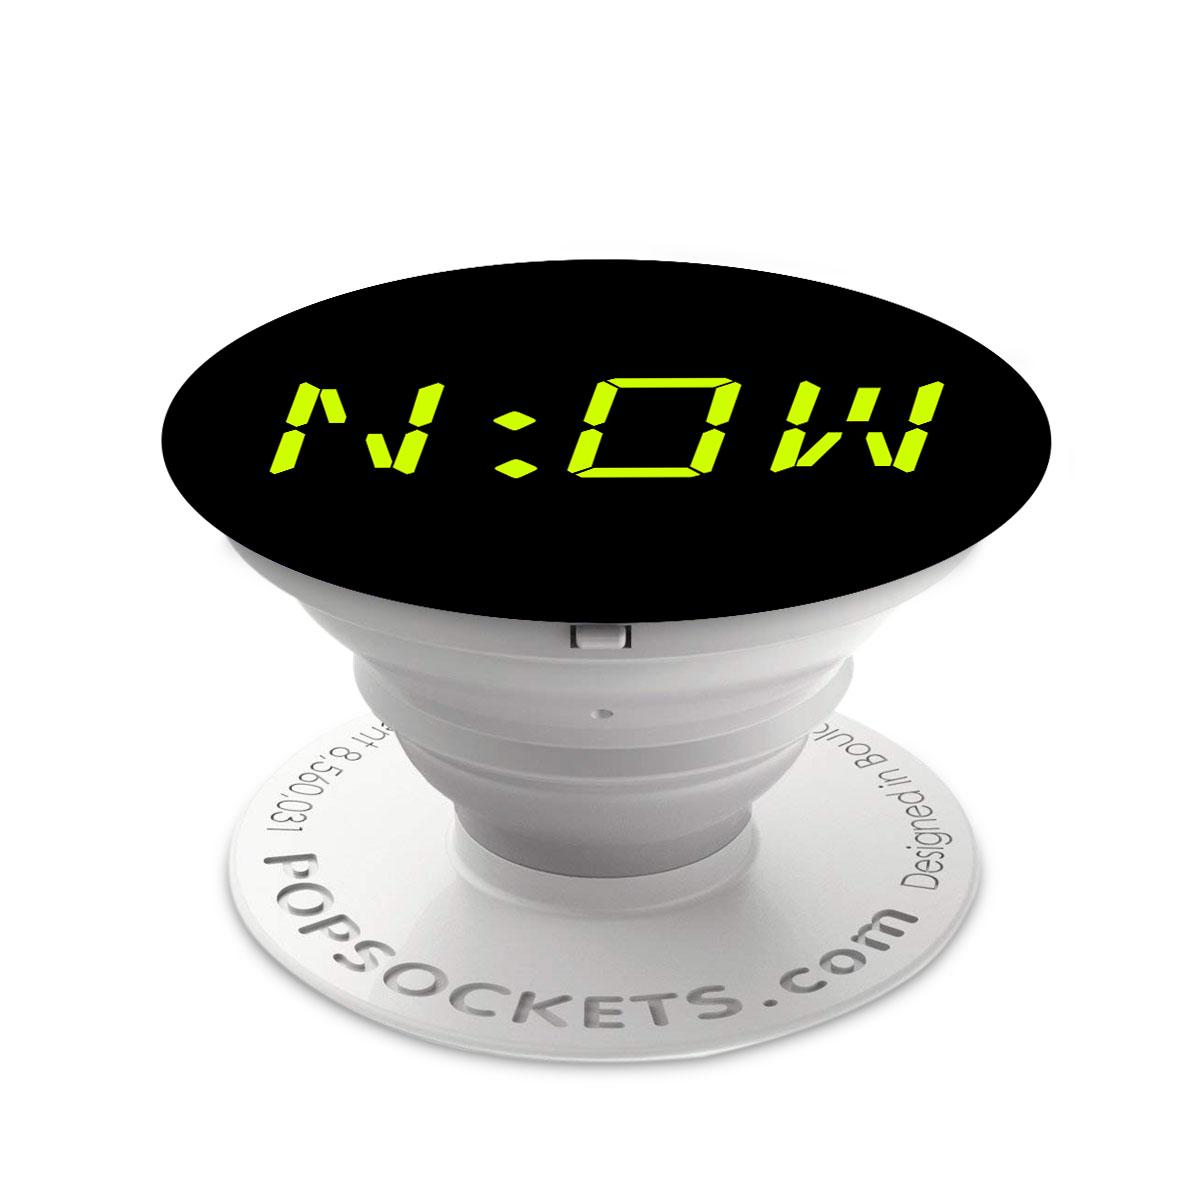 TimeIsNow_Mock2.jpg